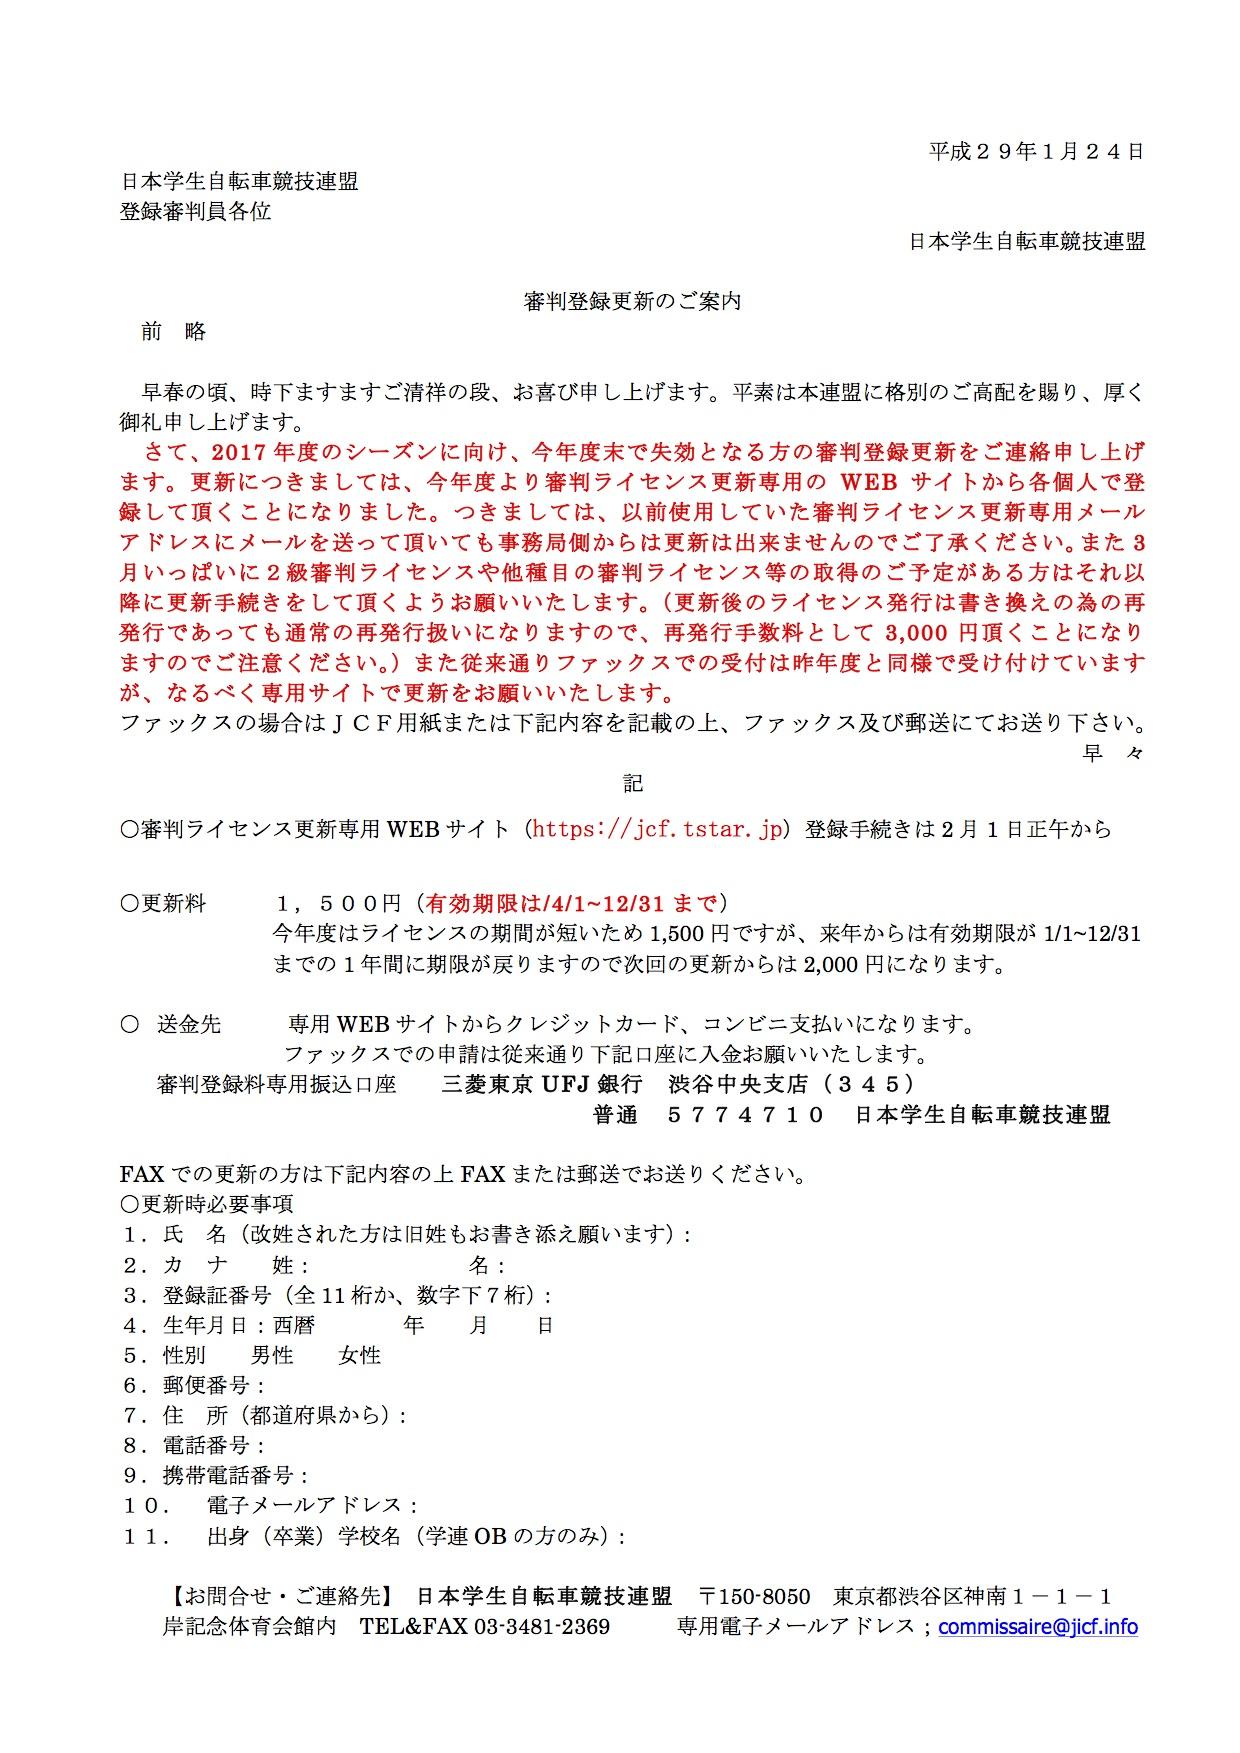 17shinpan_sikakukoushin_annai_170124_01